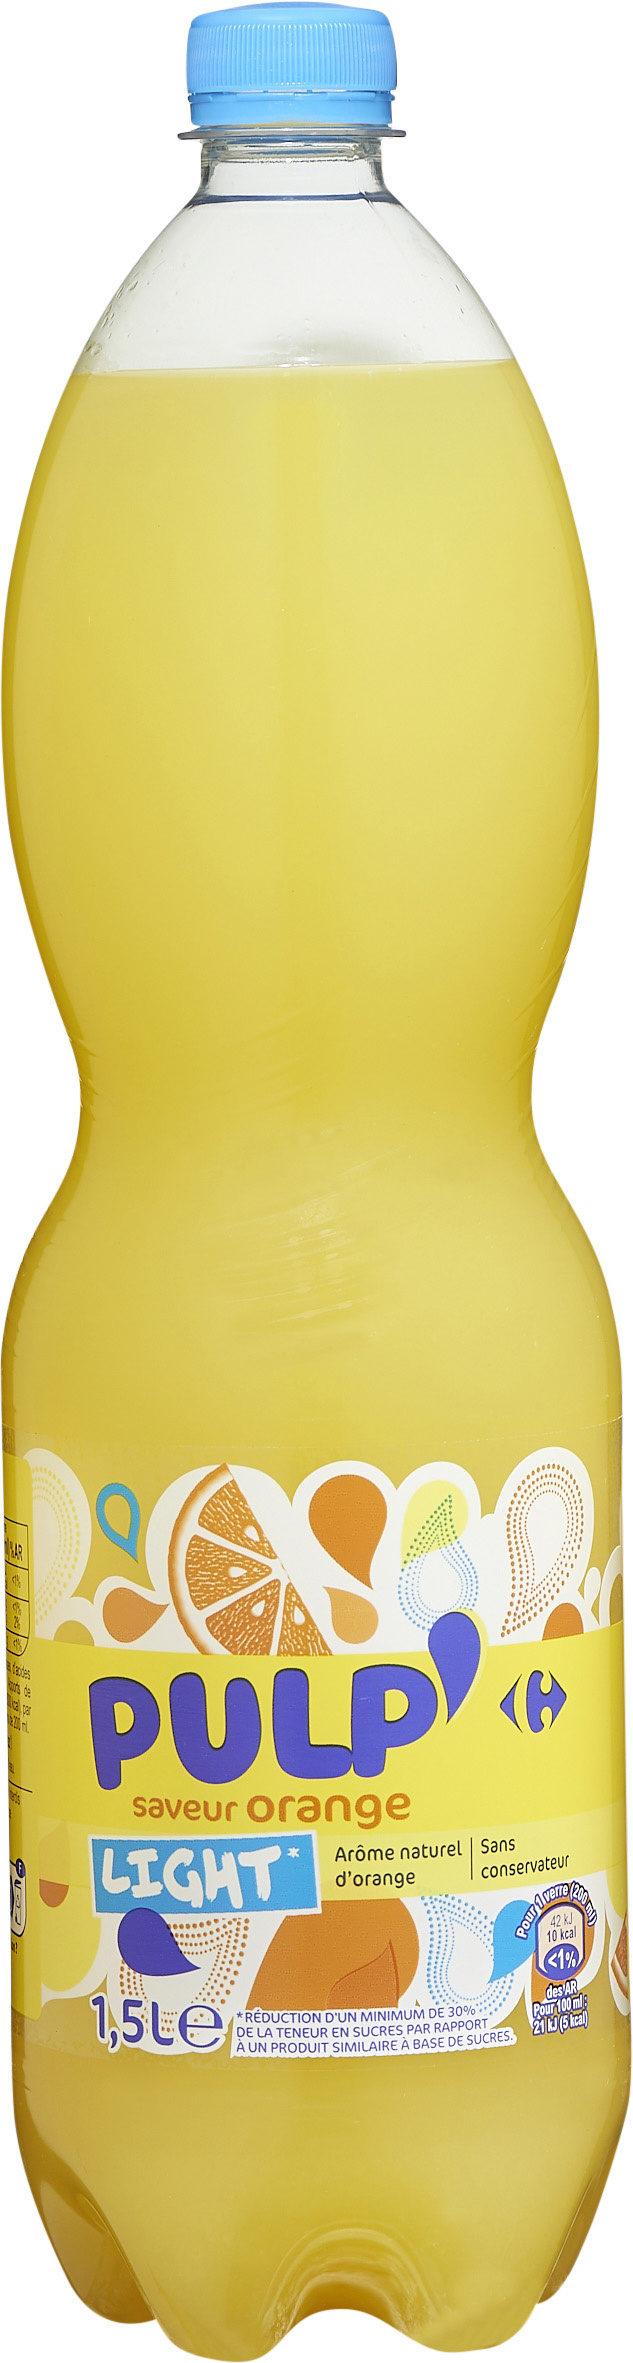 Pulp'saveur orangelight* - Produit - fr